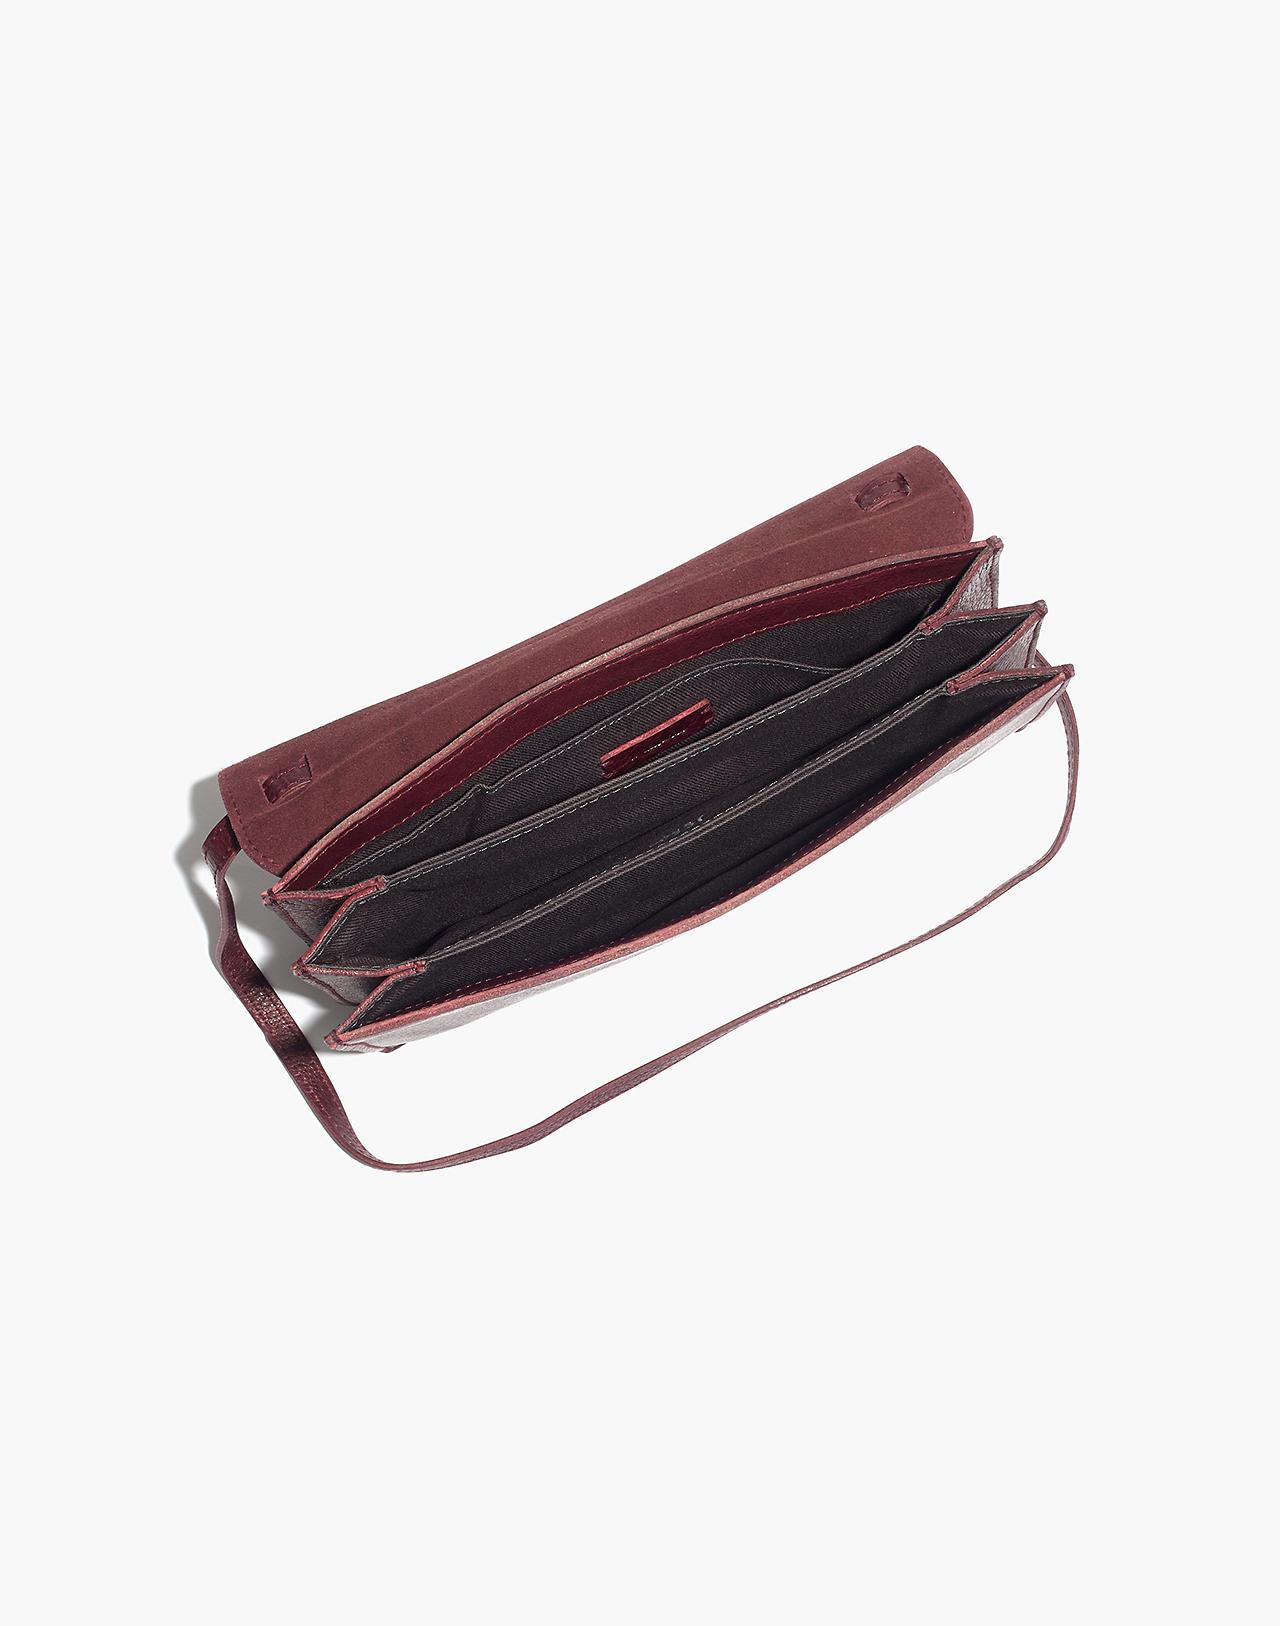 c5c6e51e2d17 The Slim Convertible Bag in dark cabernet image 2